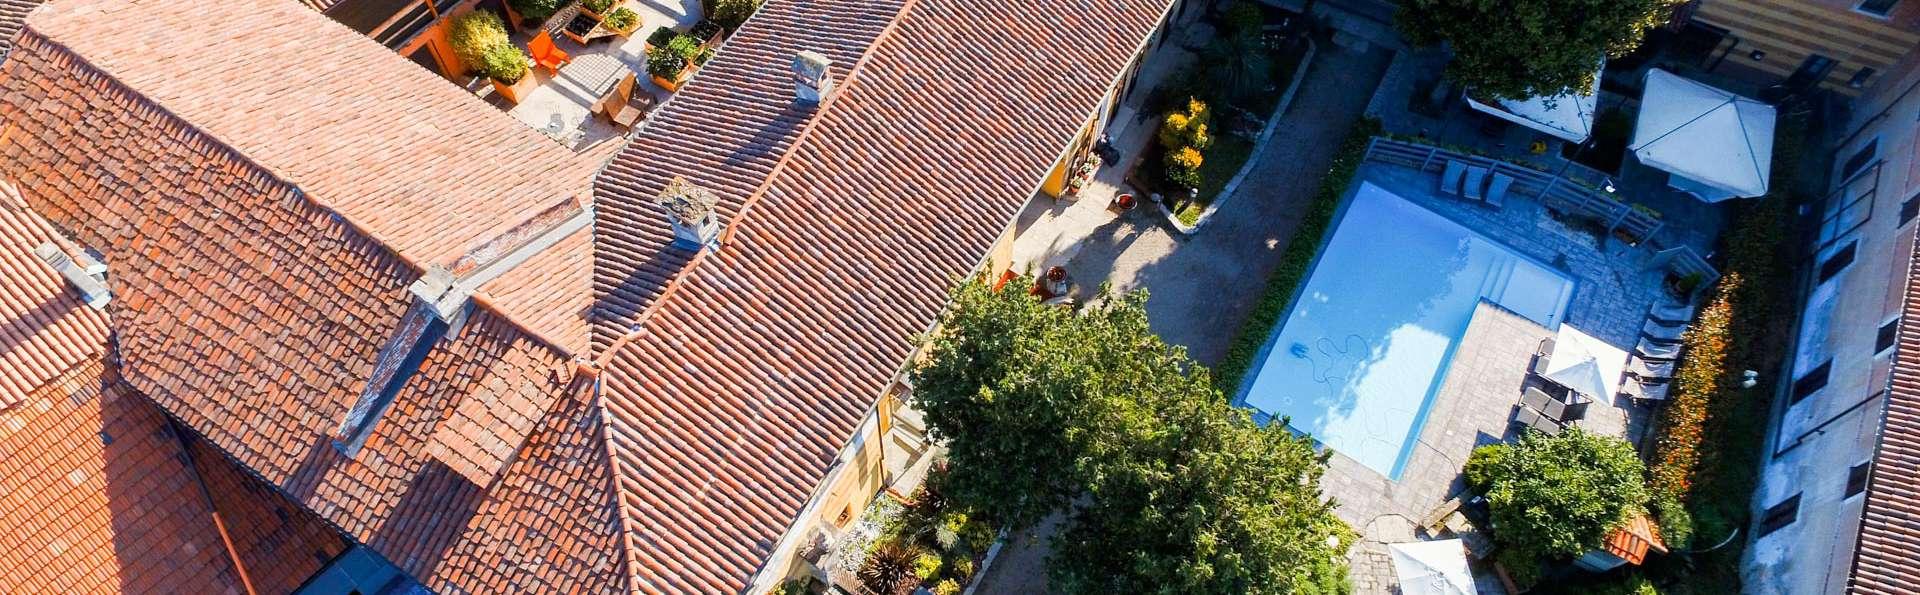 Hotel Tenimento Al Castello - EDIT_AERIAL_01.jpg